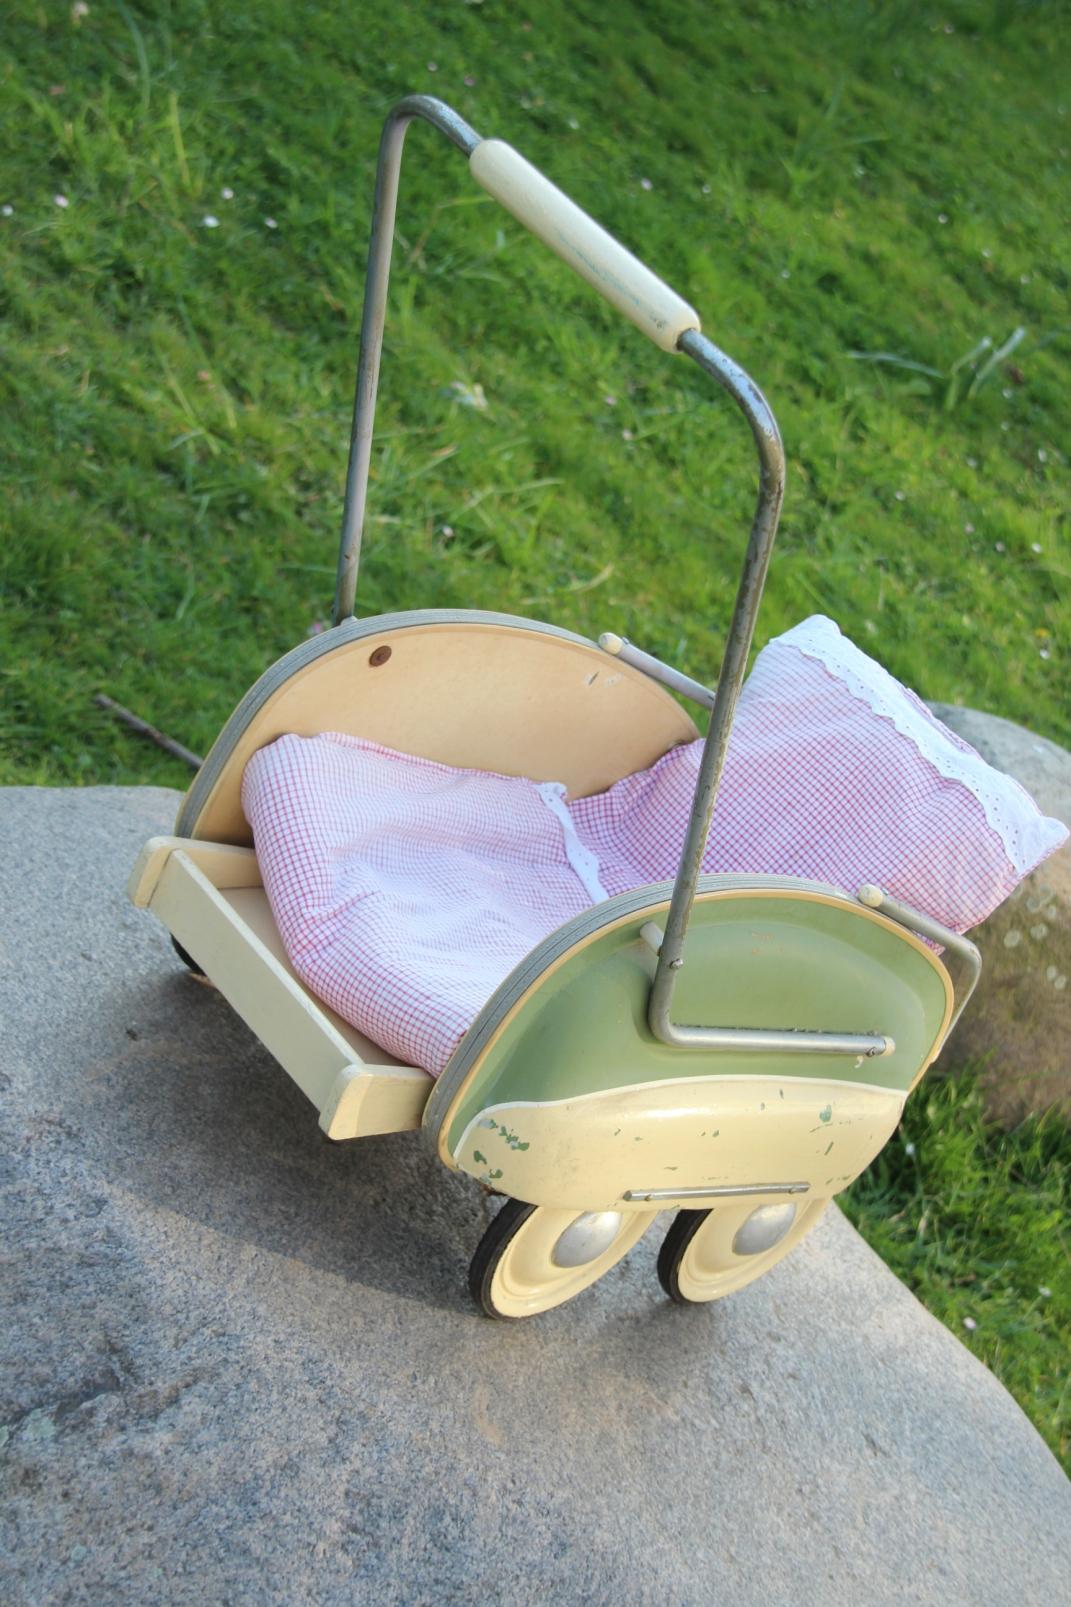 nostalgischer puppen kinderwagen vintage retro 1950 sport. Black Bedroom Furniture Sets. Home Design Ideas